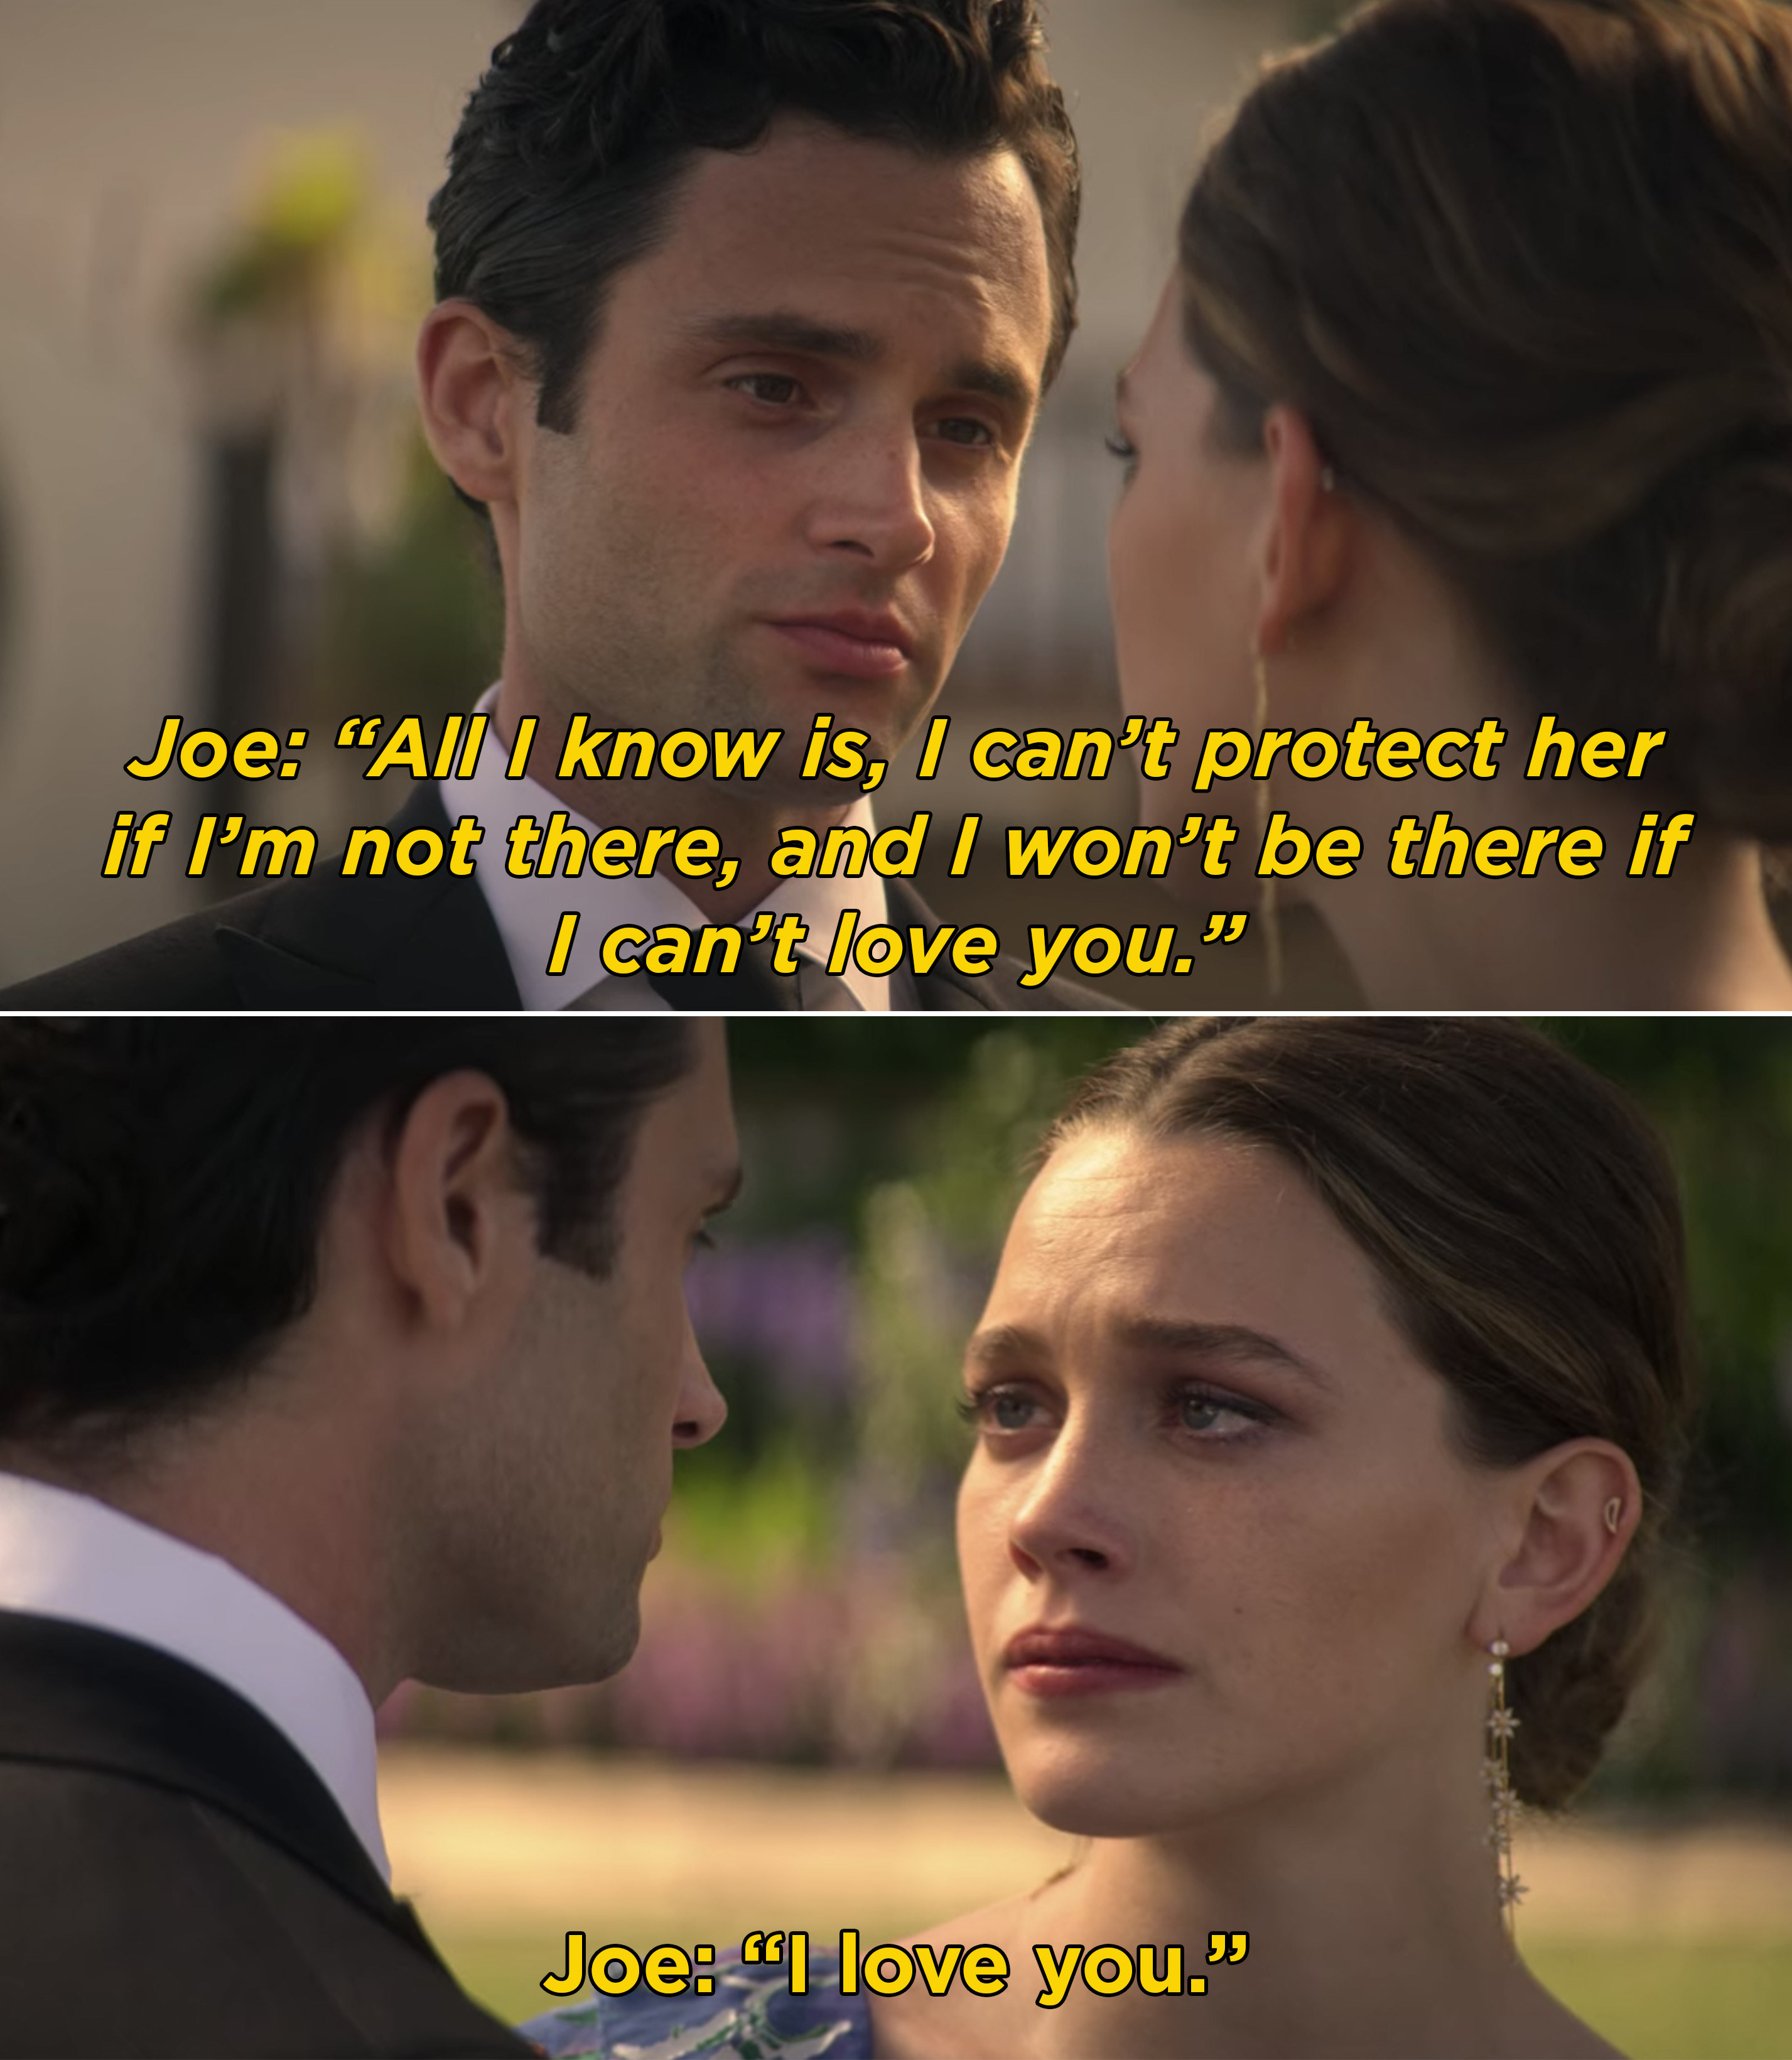 Joe telling Love that he loves her